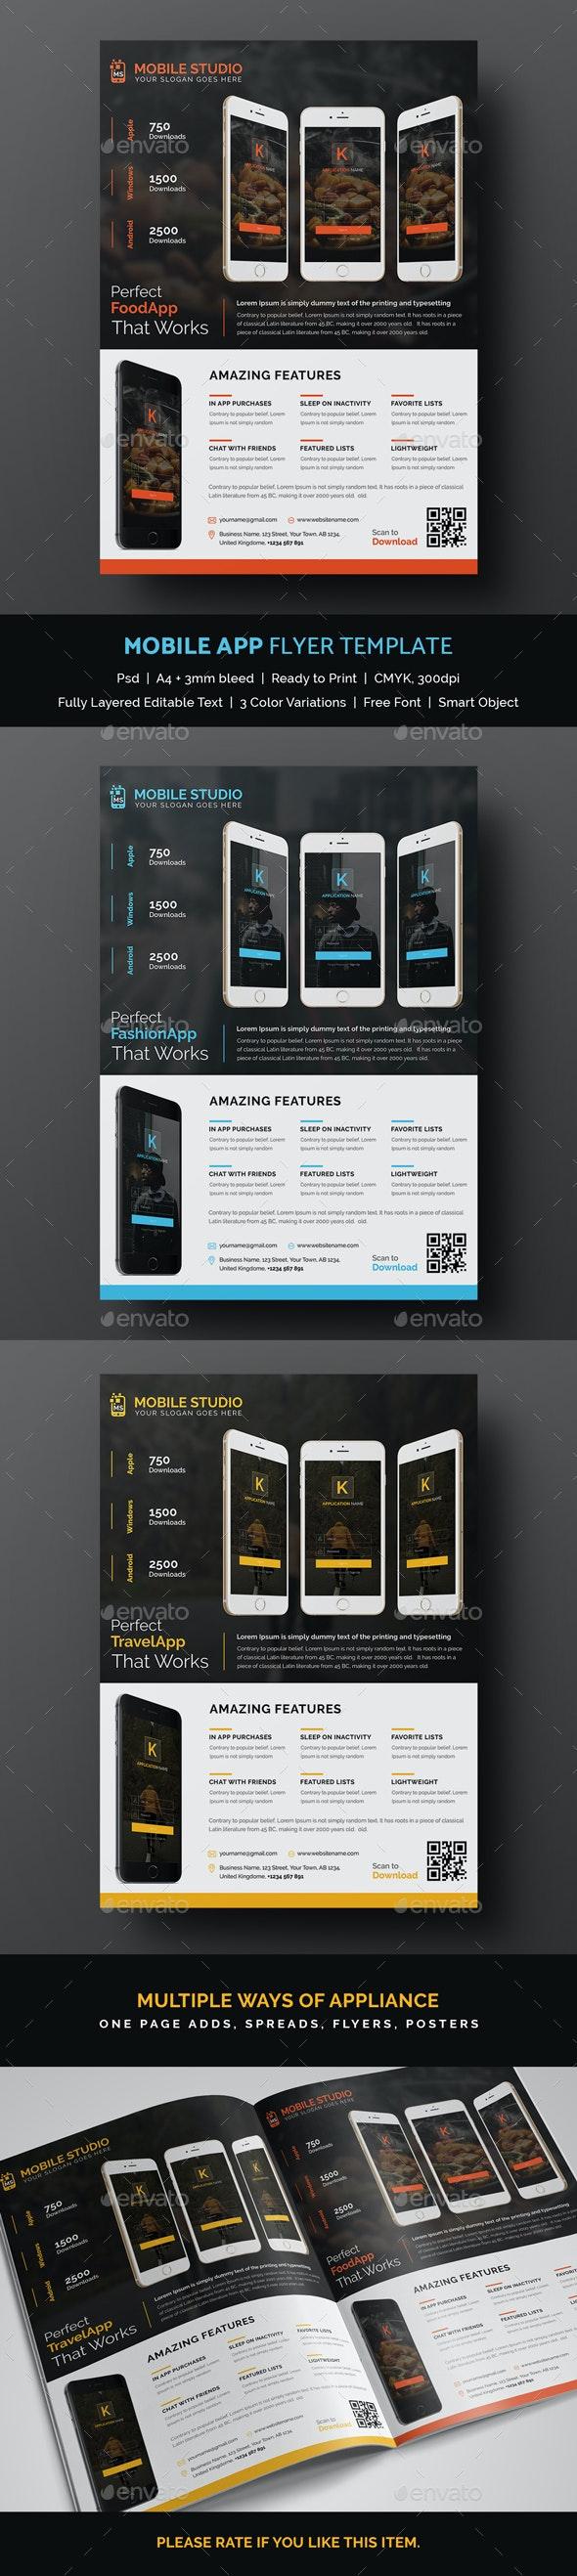 Mobile App Flyer Template - Commerce Flyers